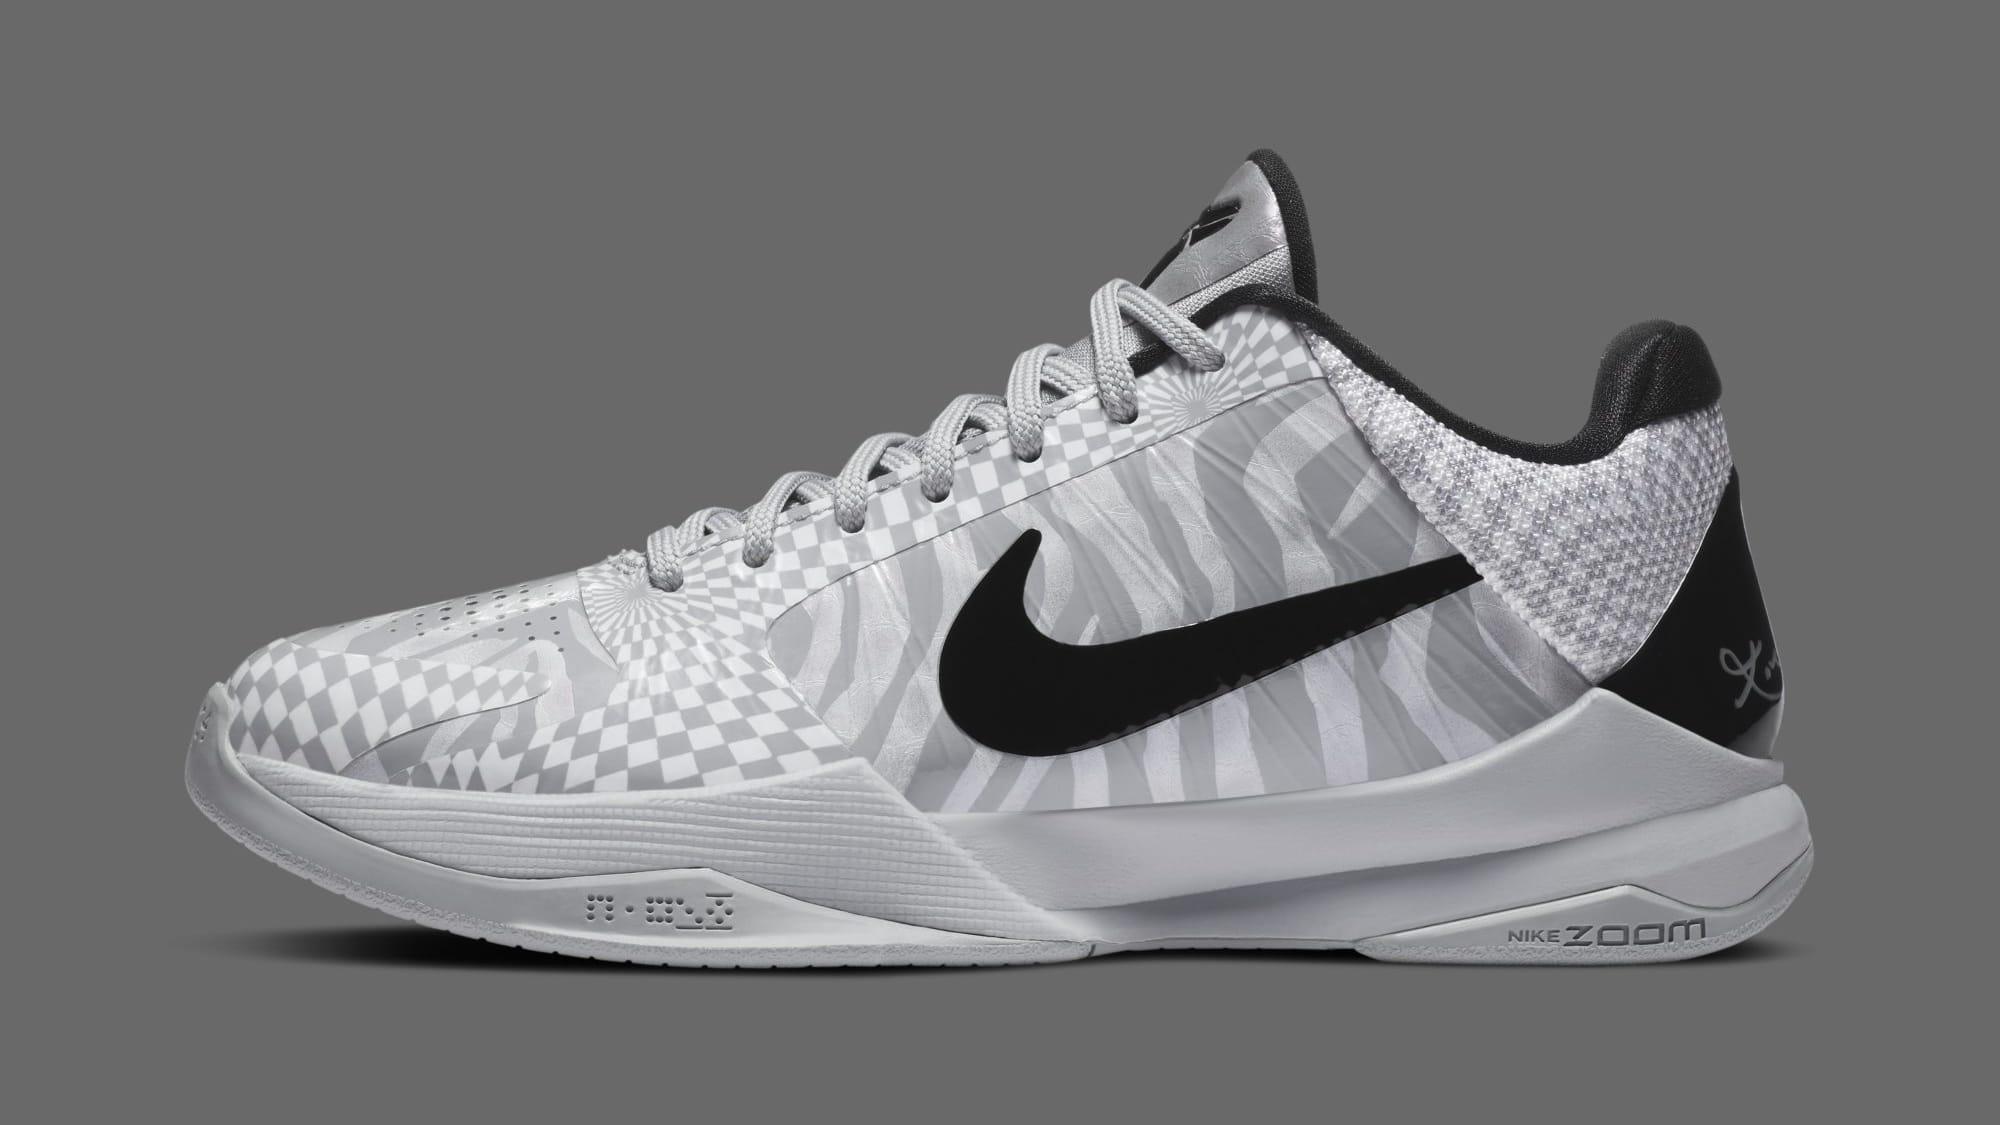 Nike Kobe 5 Protro PE 'DeMar DeRozan' CD4991-003 Lateral